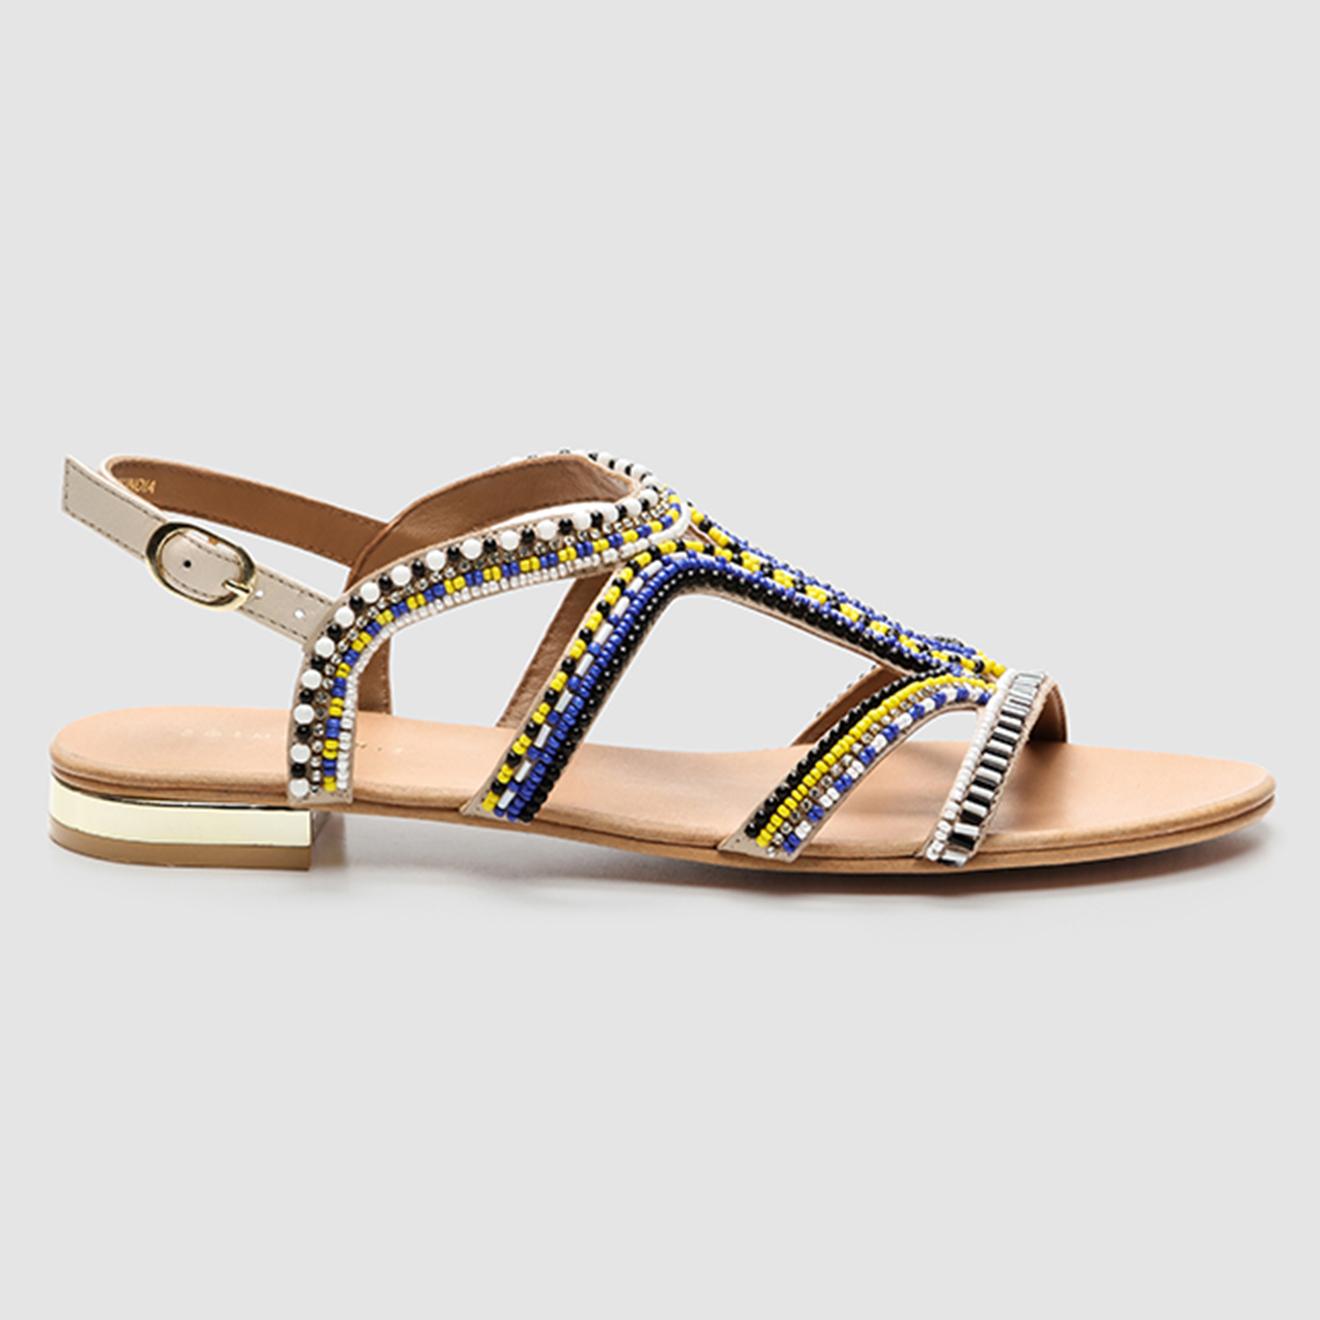 Sandales en Cuir Iba bleu/noir - Cosmoparis - Modalova